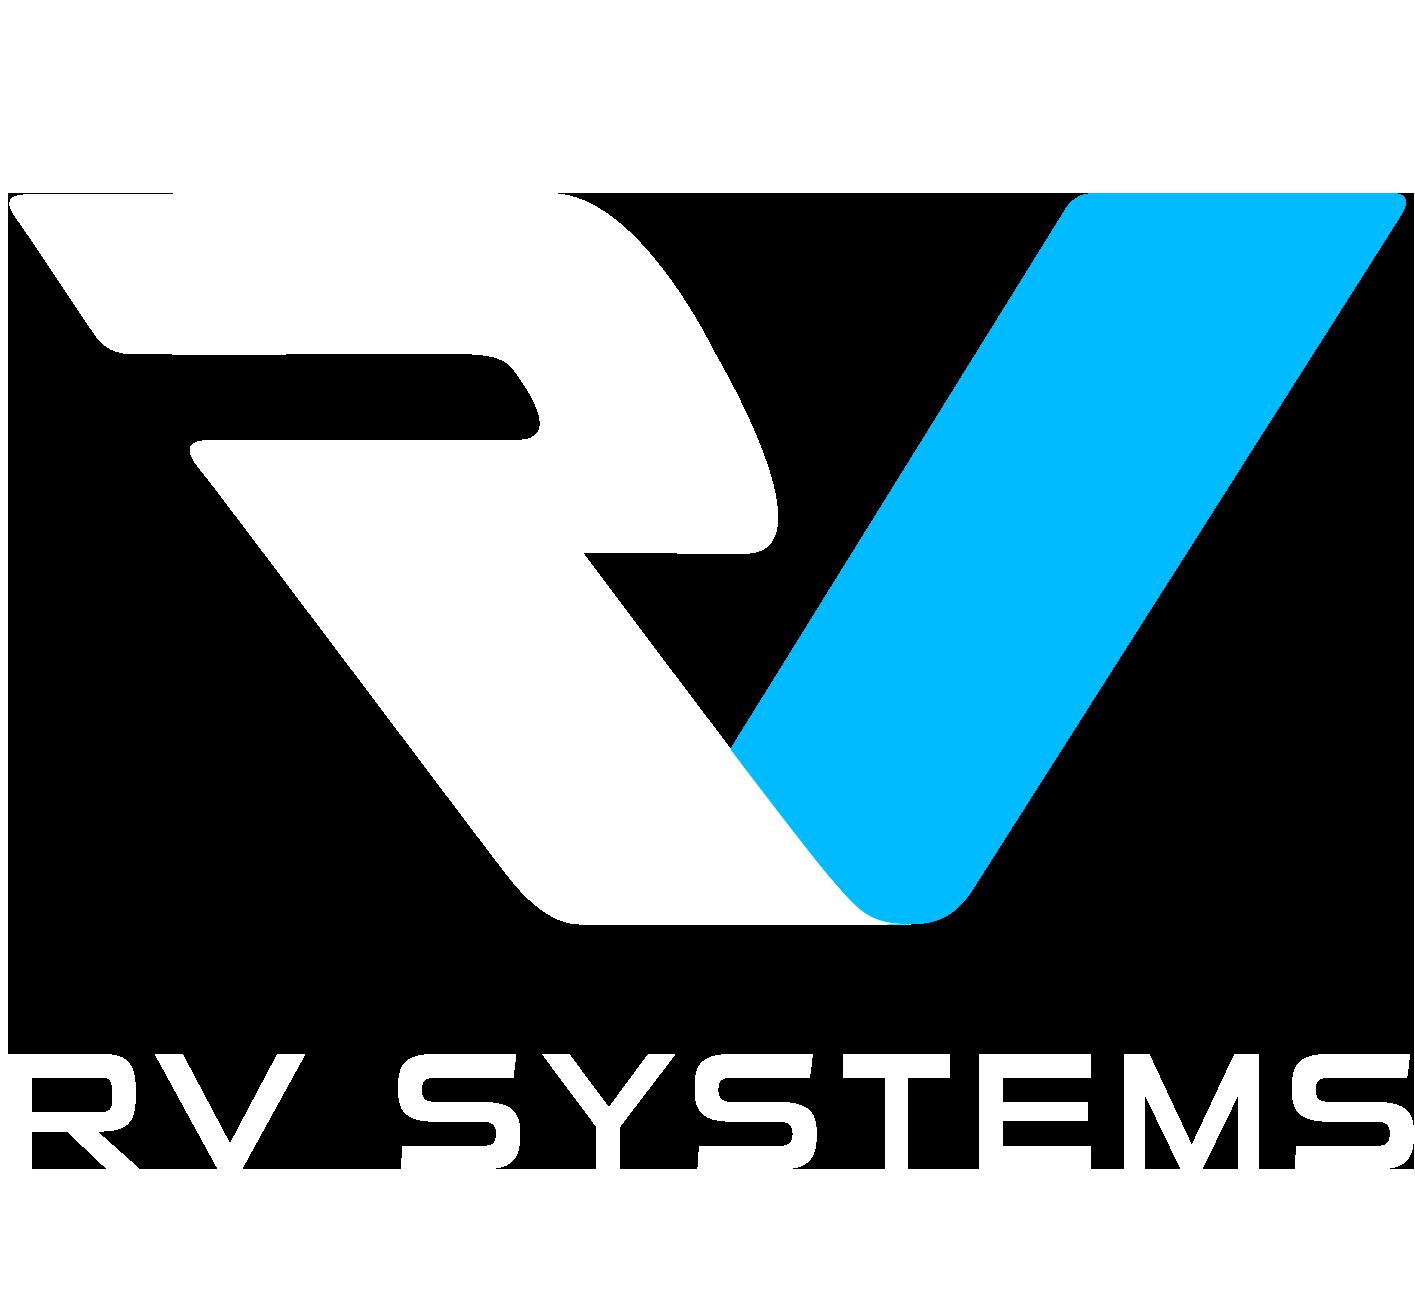 RV Systems